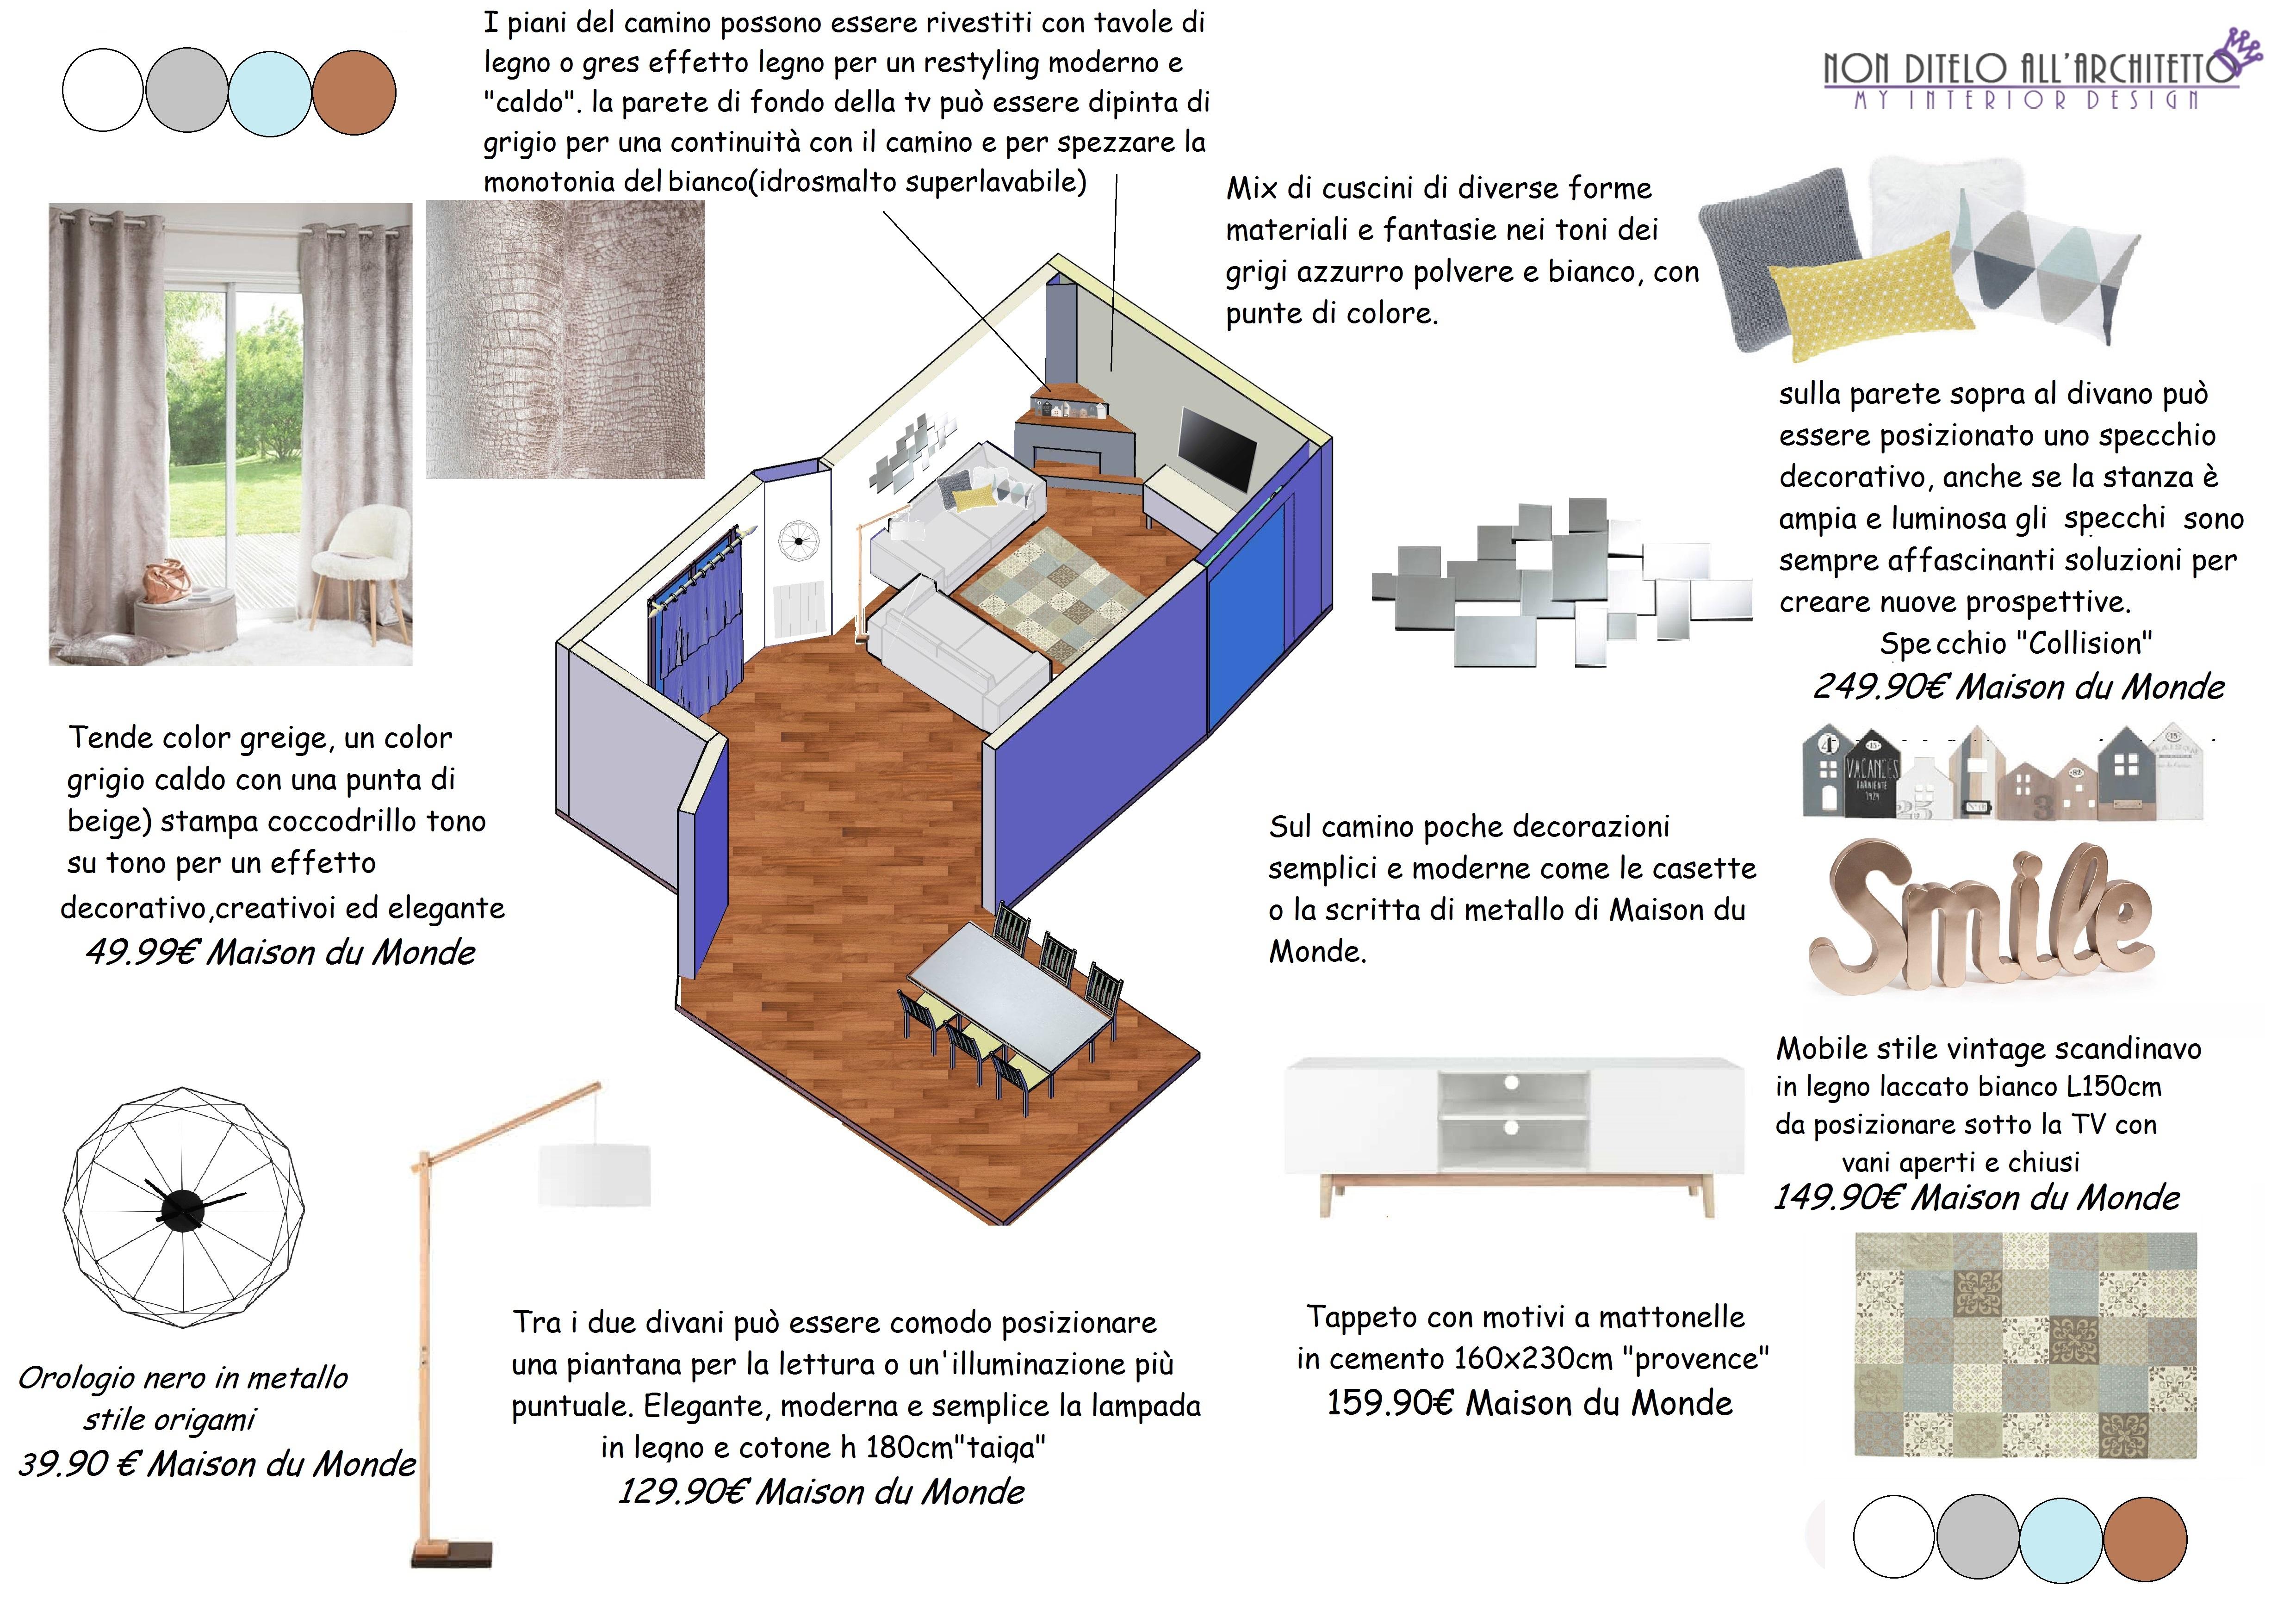 Cuscini Divano Maison Du Monde.Tav Vista Camino Architettura E Design A Roma